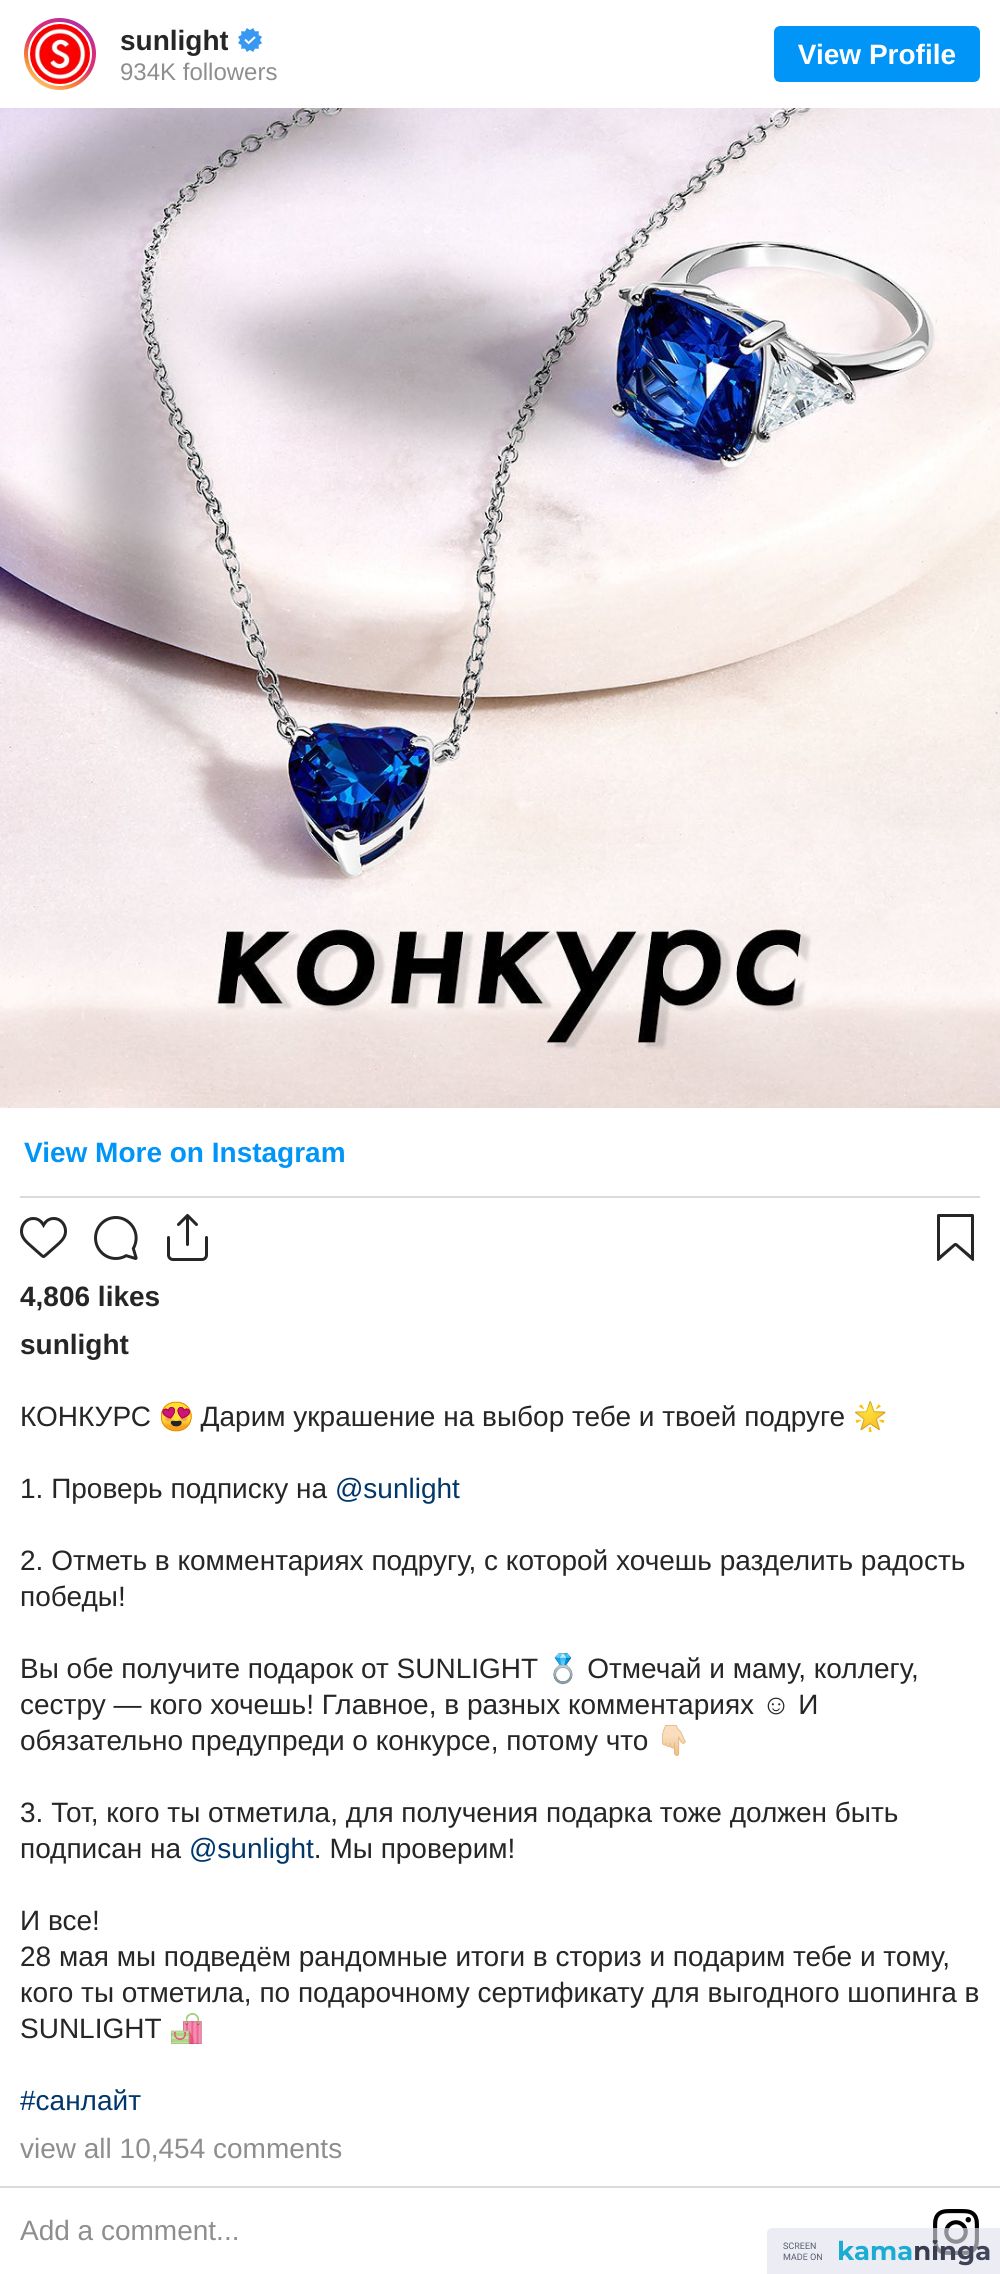 https://www.instagram.com/p/CPJa3tmM72_/